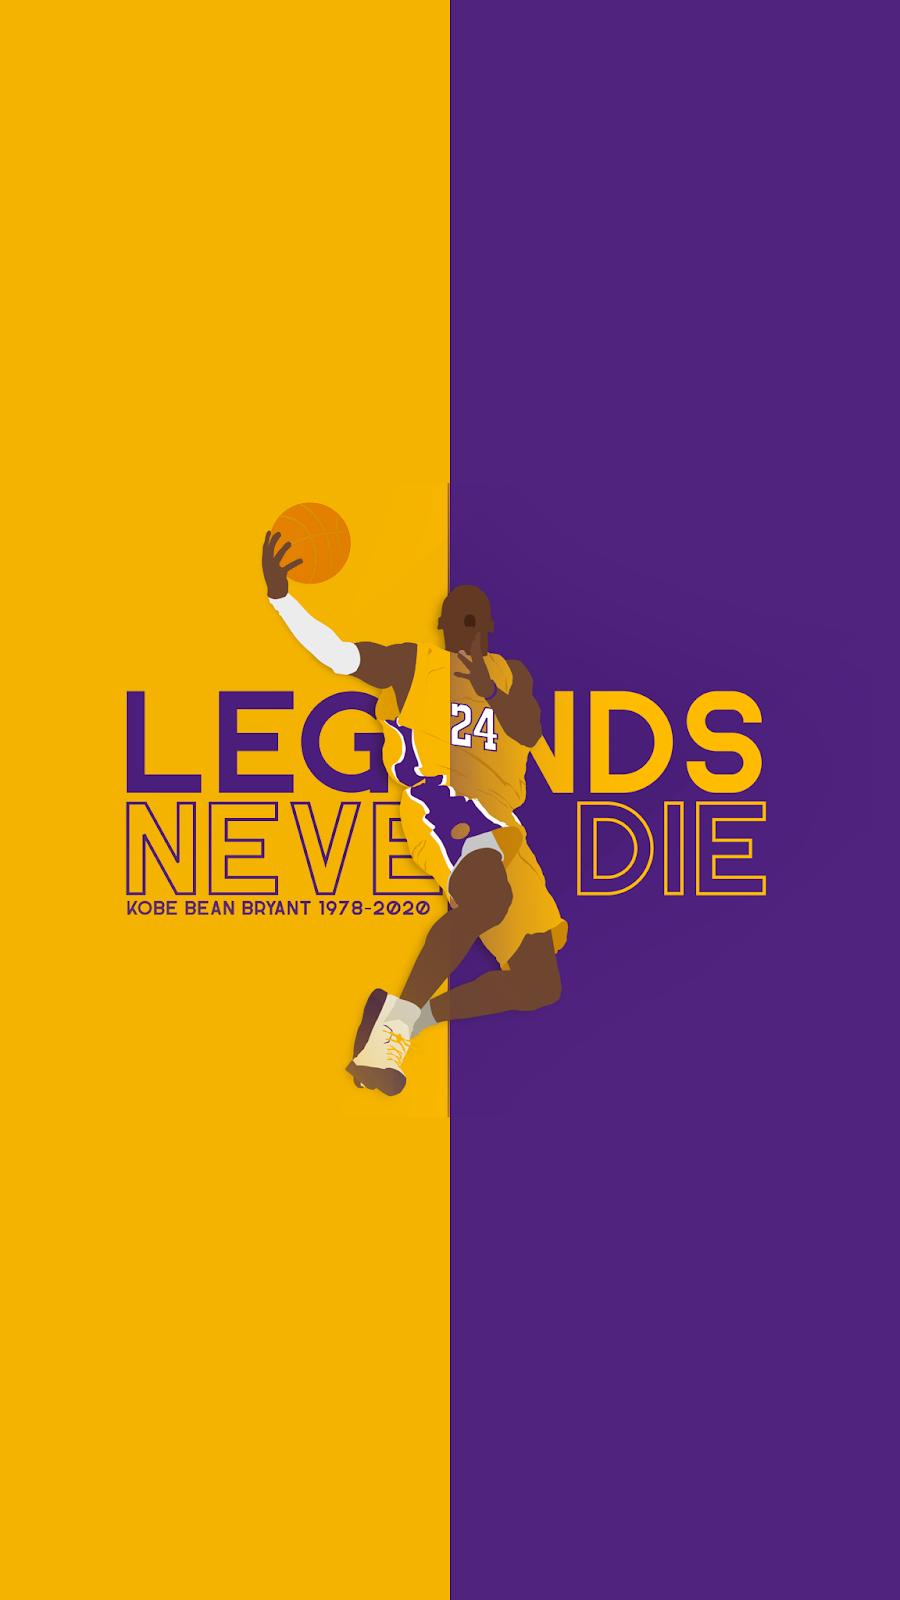 Kobe Bryant Cool Wallpapers for Phone in 2020 Kobe